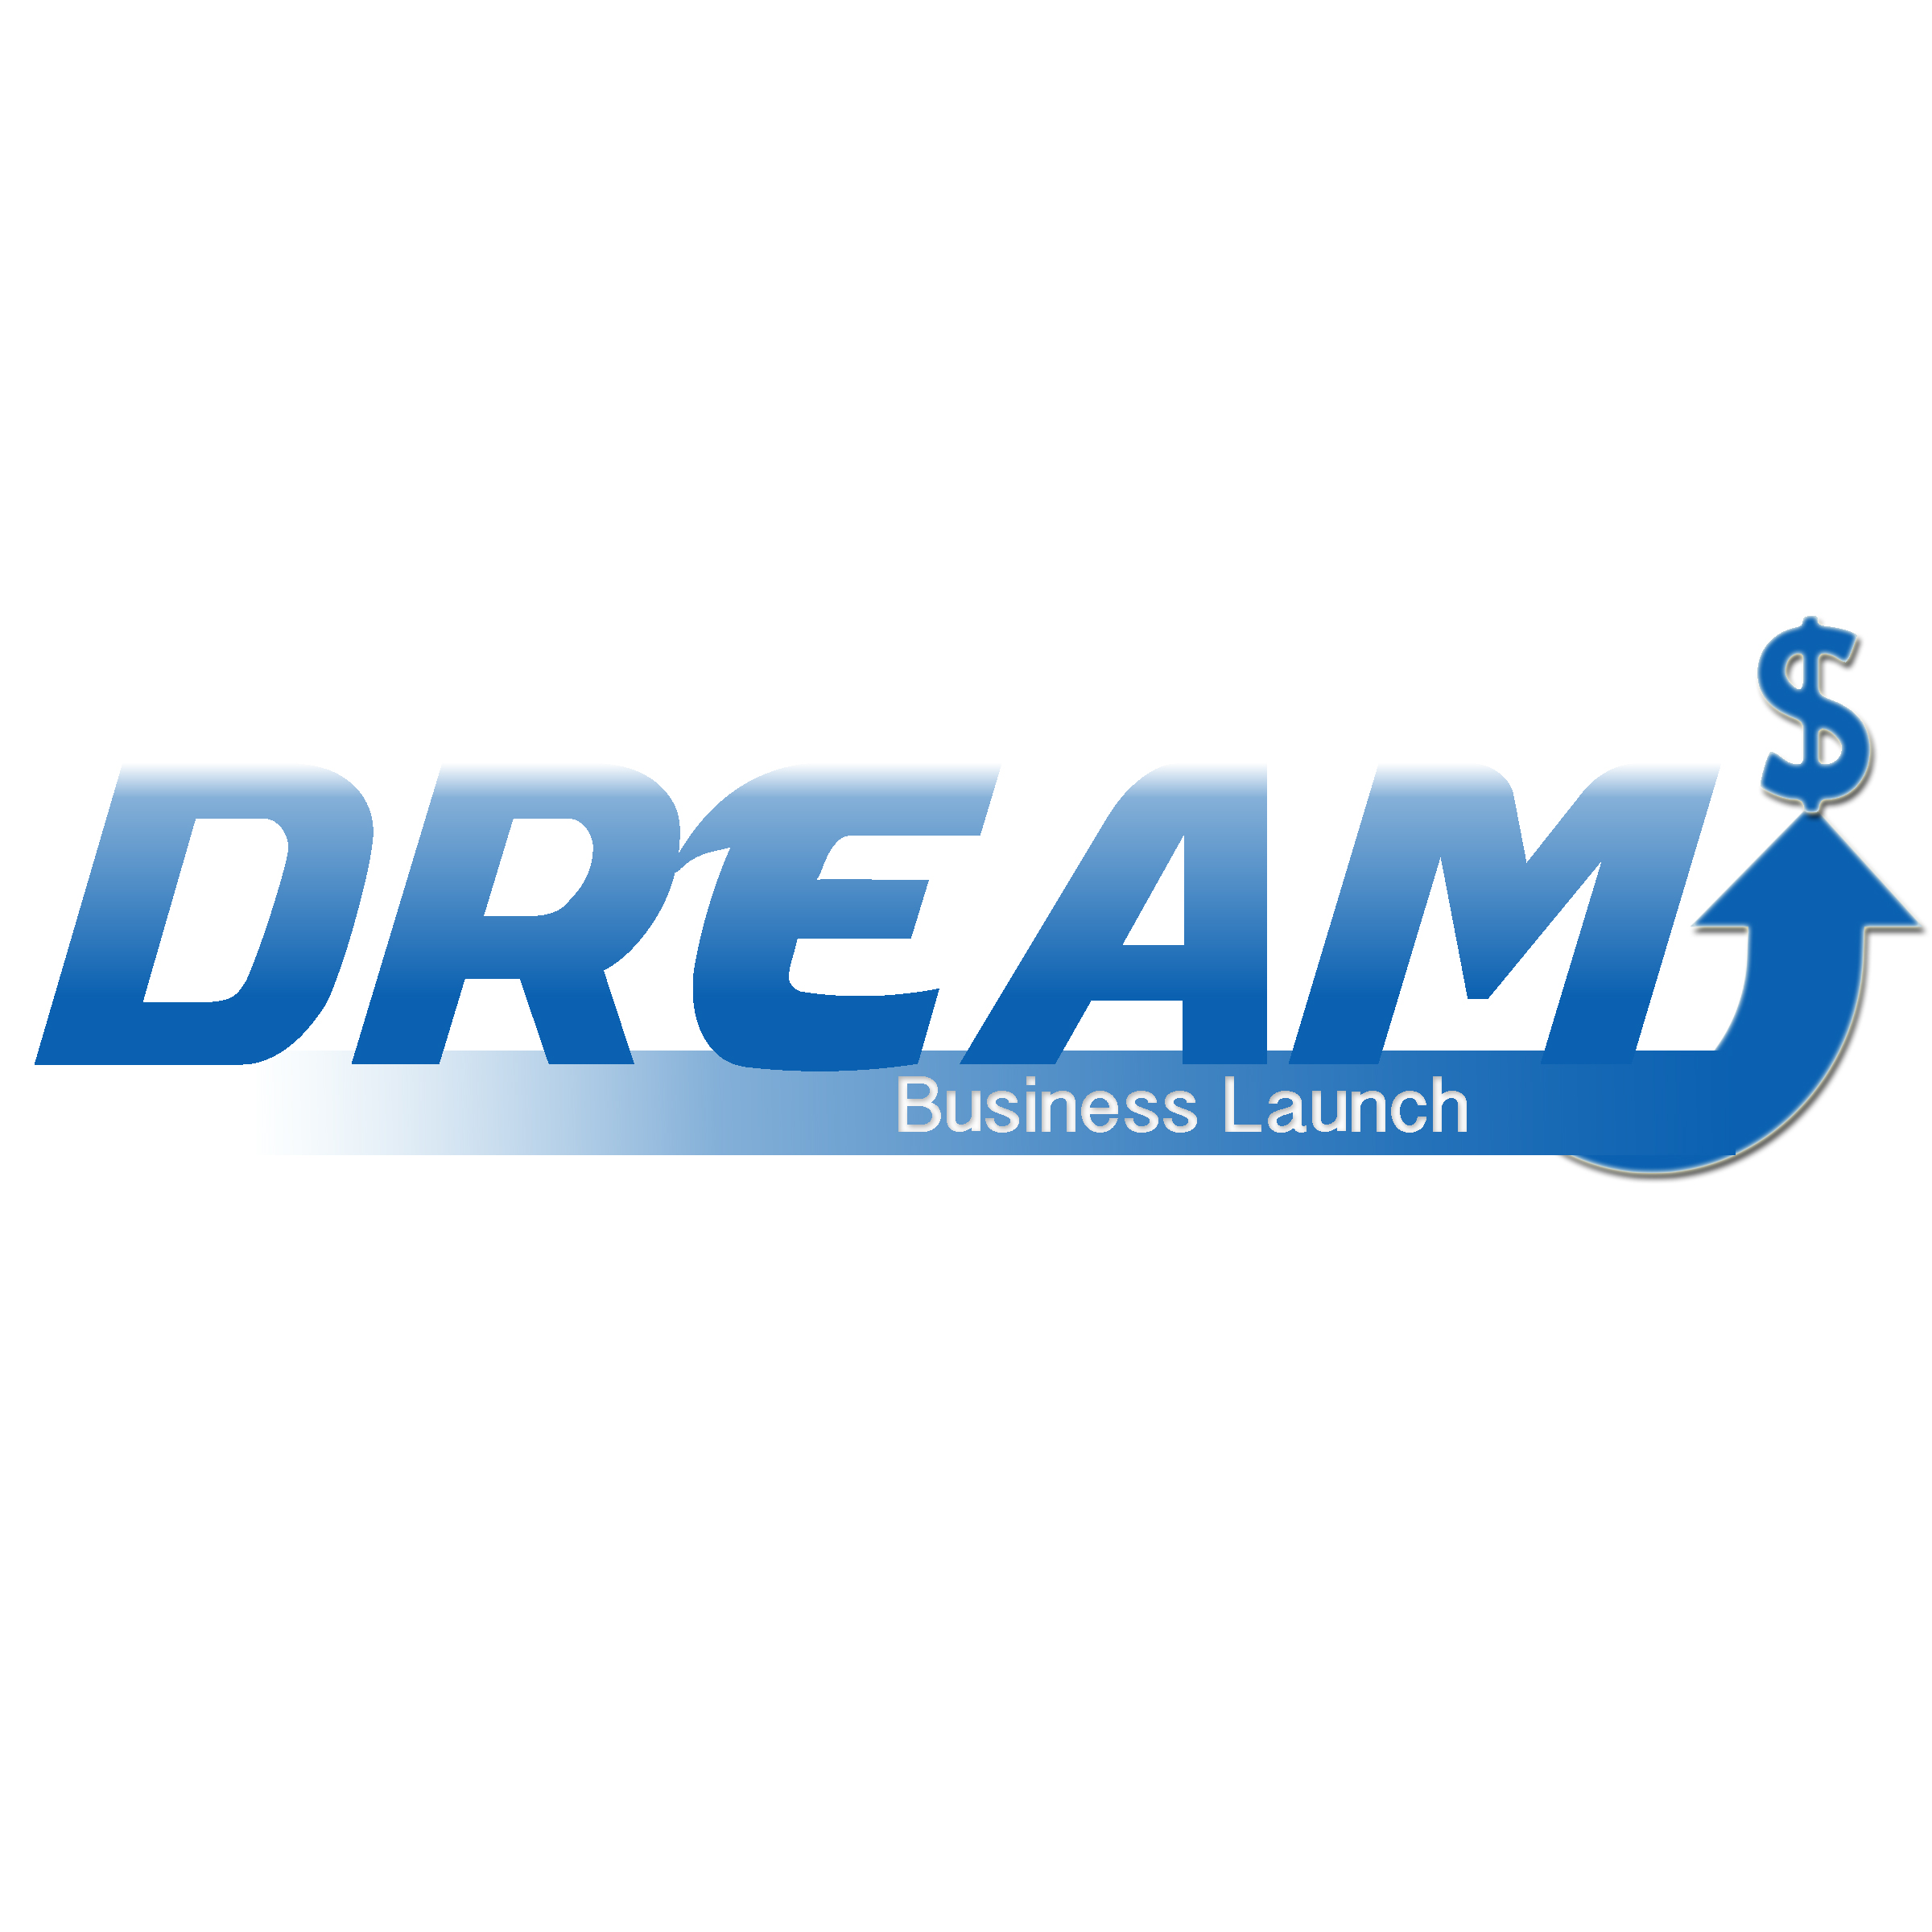 Dream Business Launch